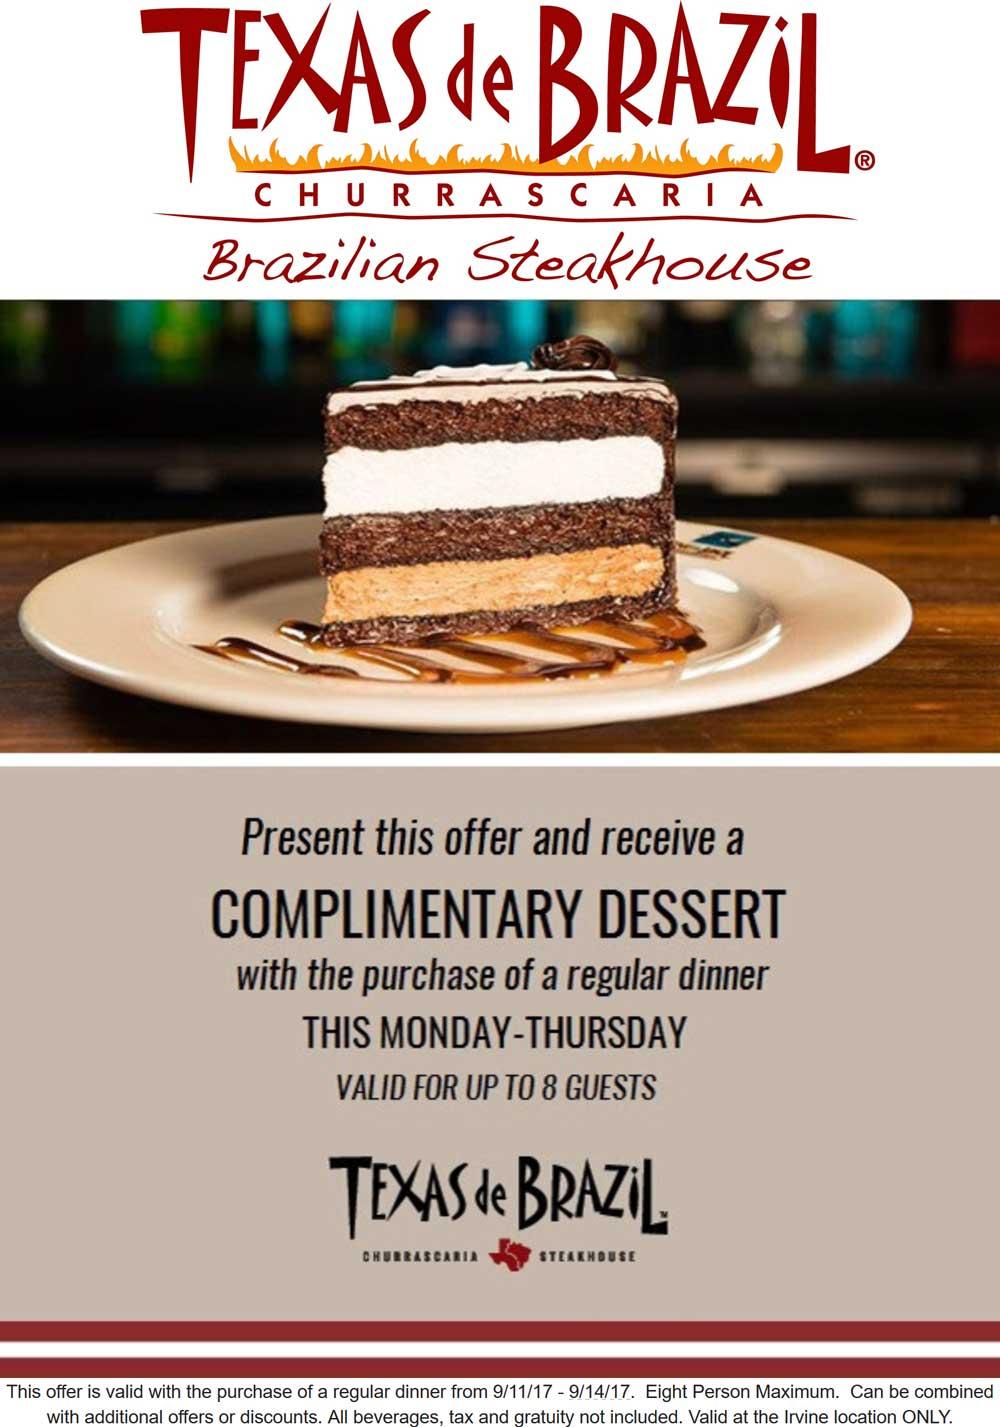 Texas de Brazil Coupon October 2018 Free dessert with your dinner at Texas de Brazil